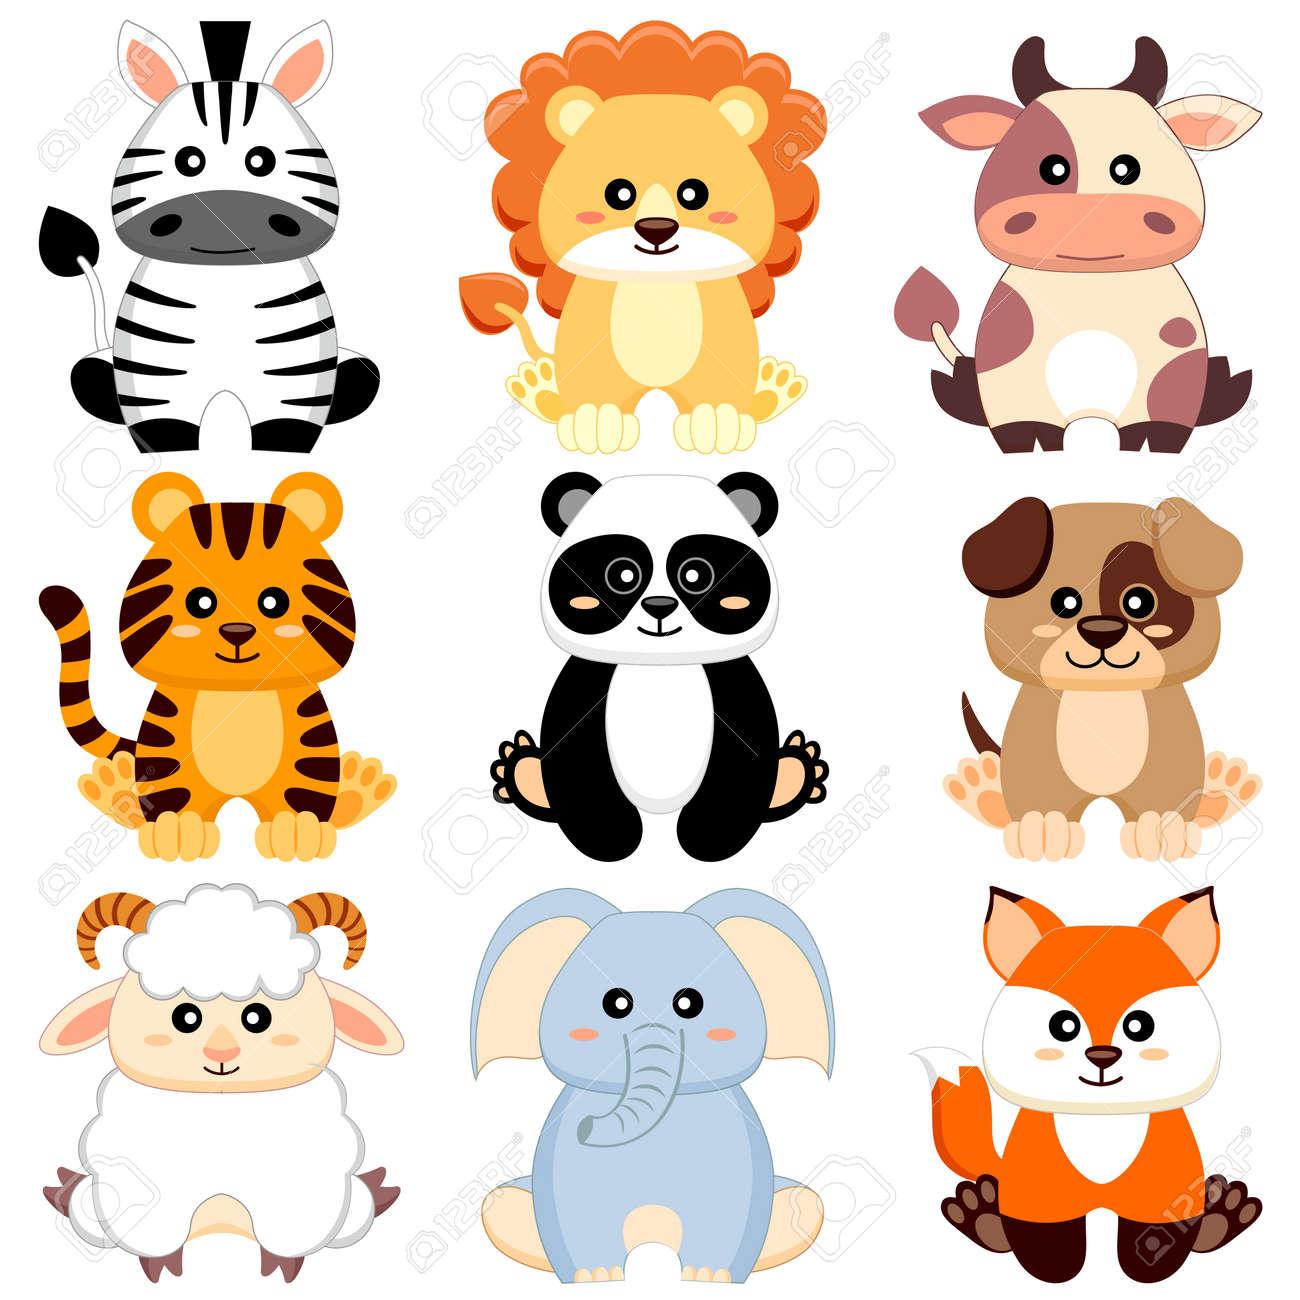 Cute cartoon baby animals  Dog, cow, lion, sheep, tiger, panda,